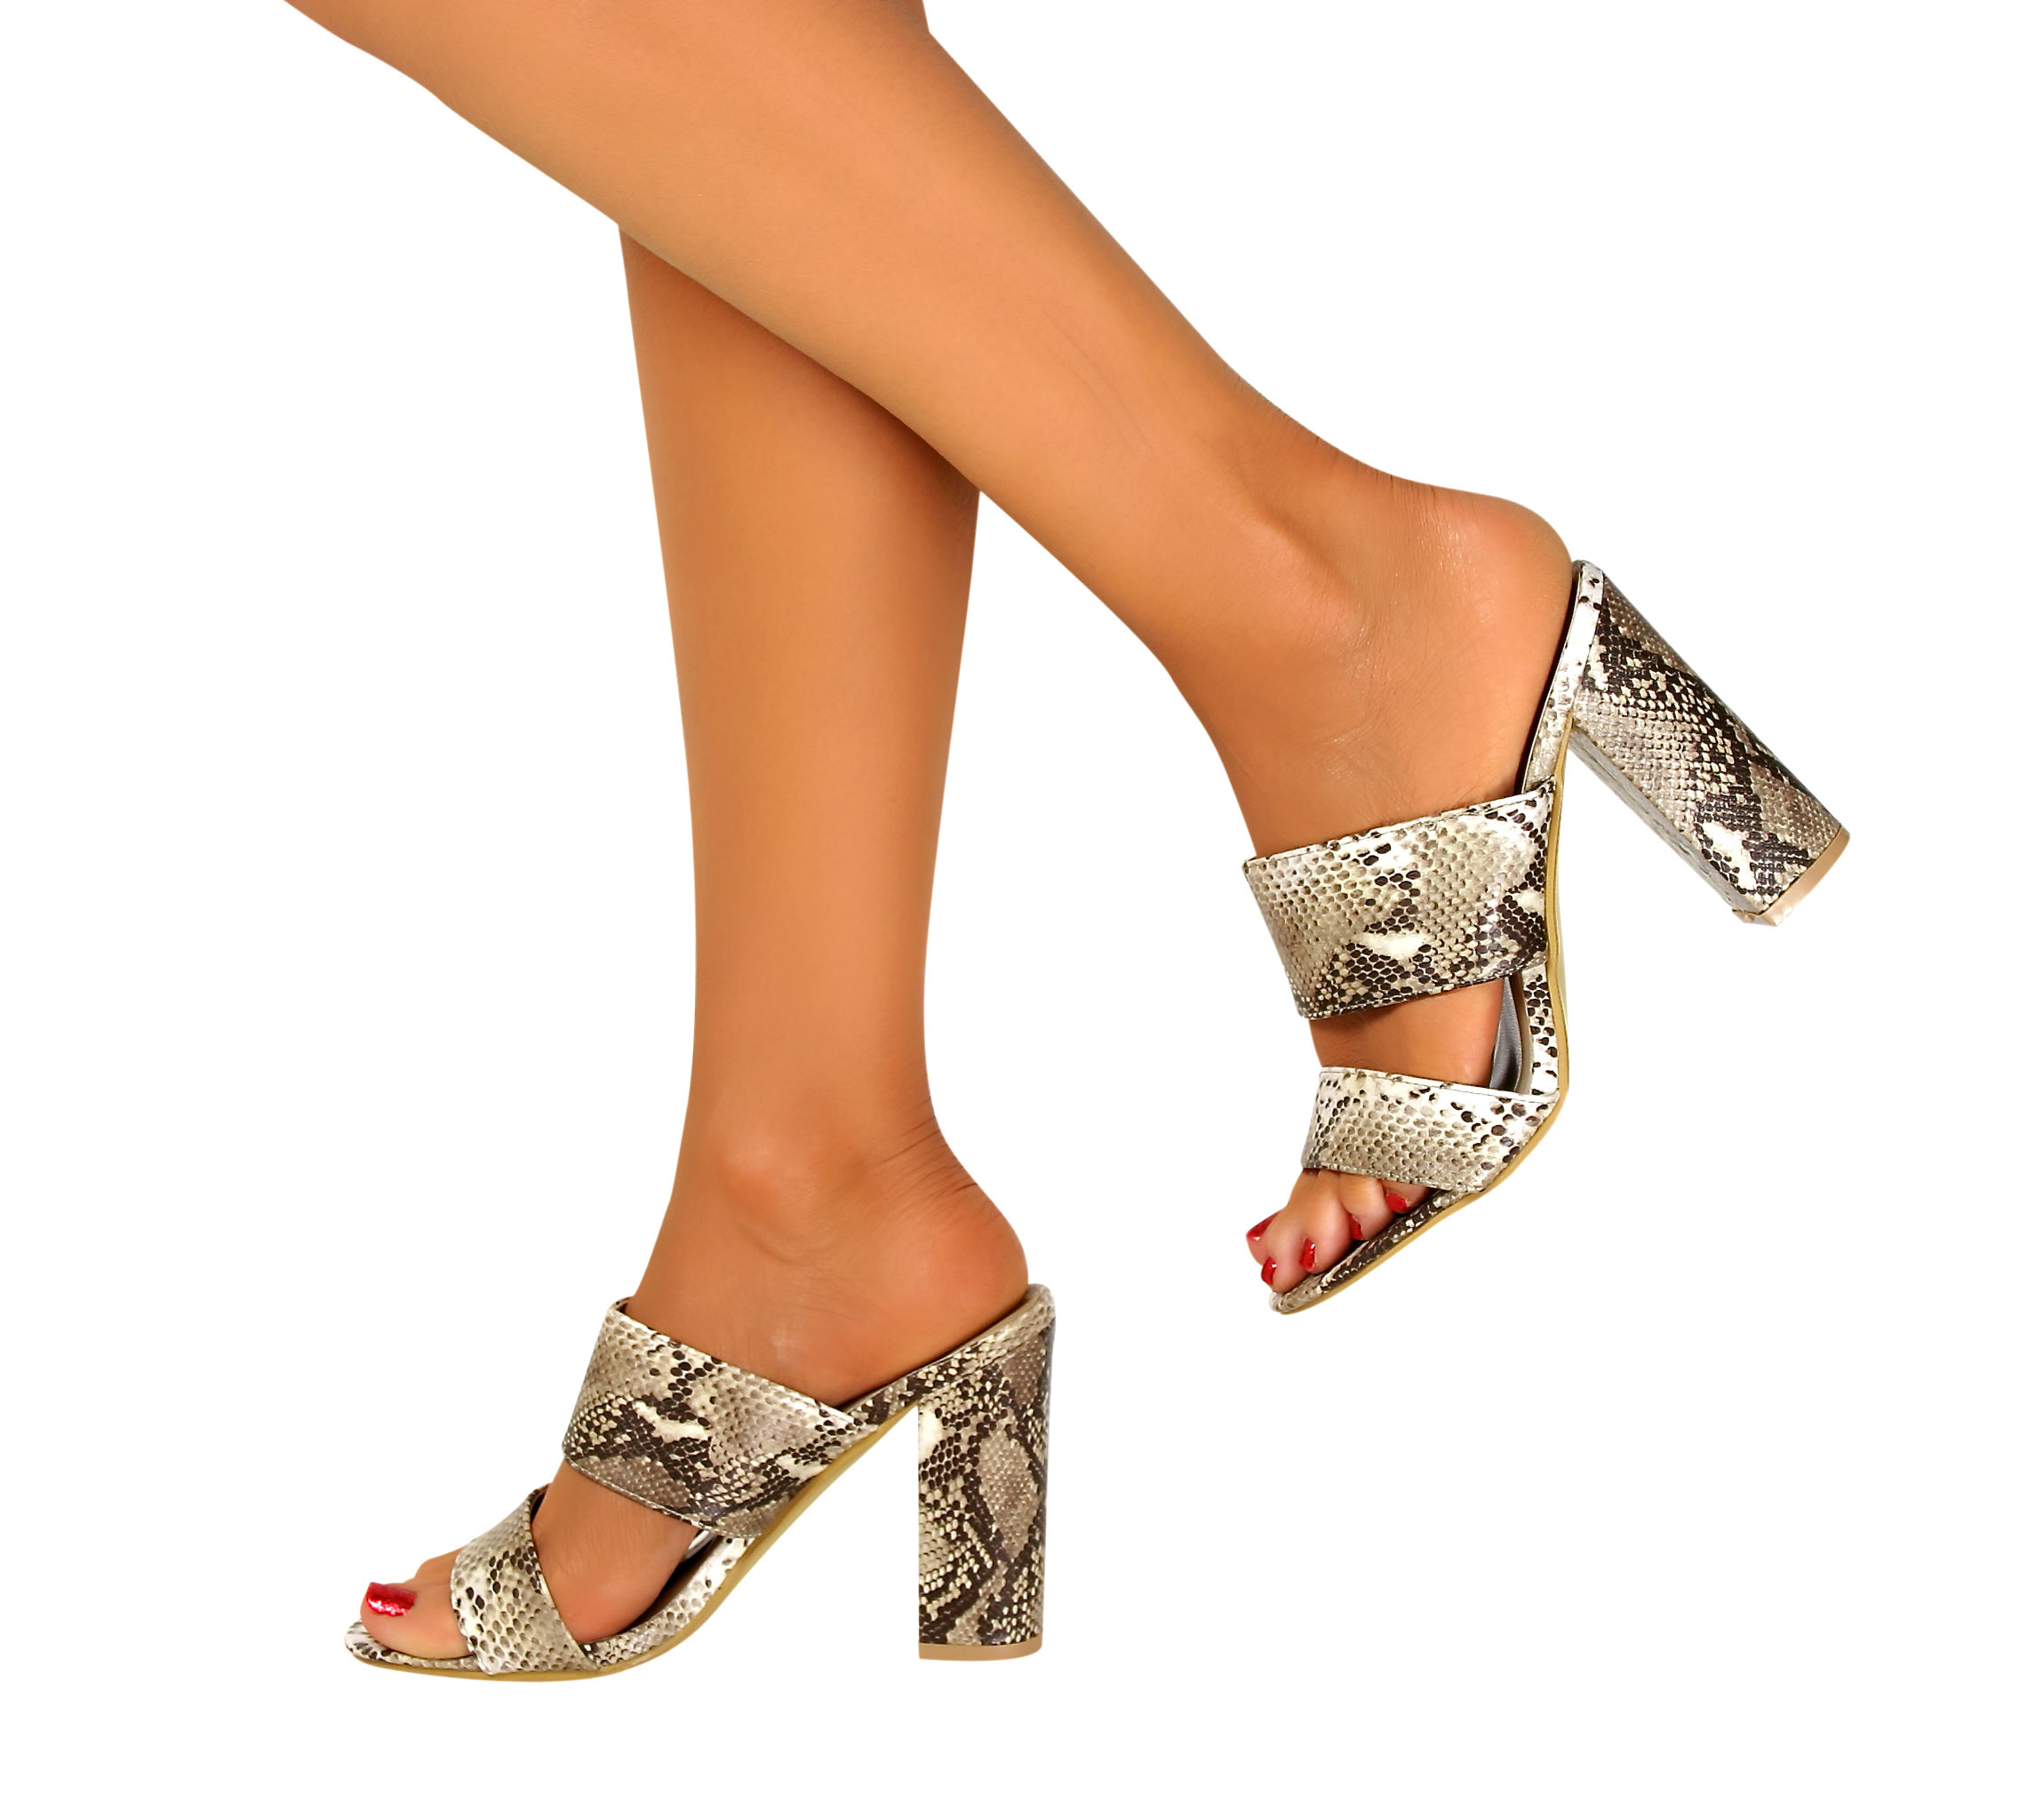 damen block mitte high heels riemchen offener spitze sommer abend sandalen uk ebay. Black Bedroom Furniture Sets. Home Design Ideas